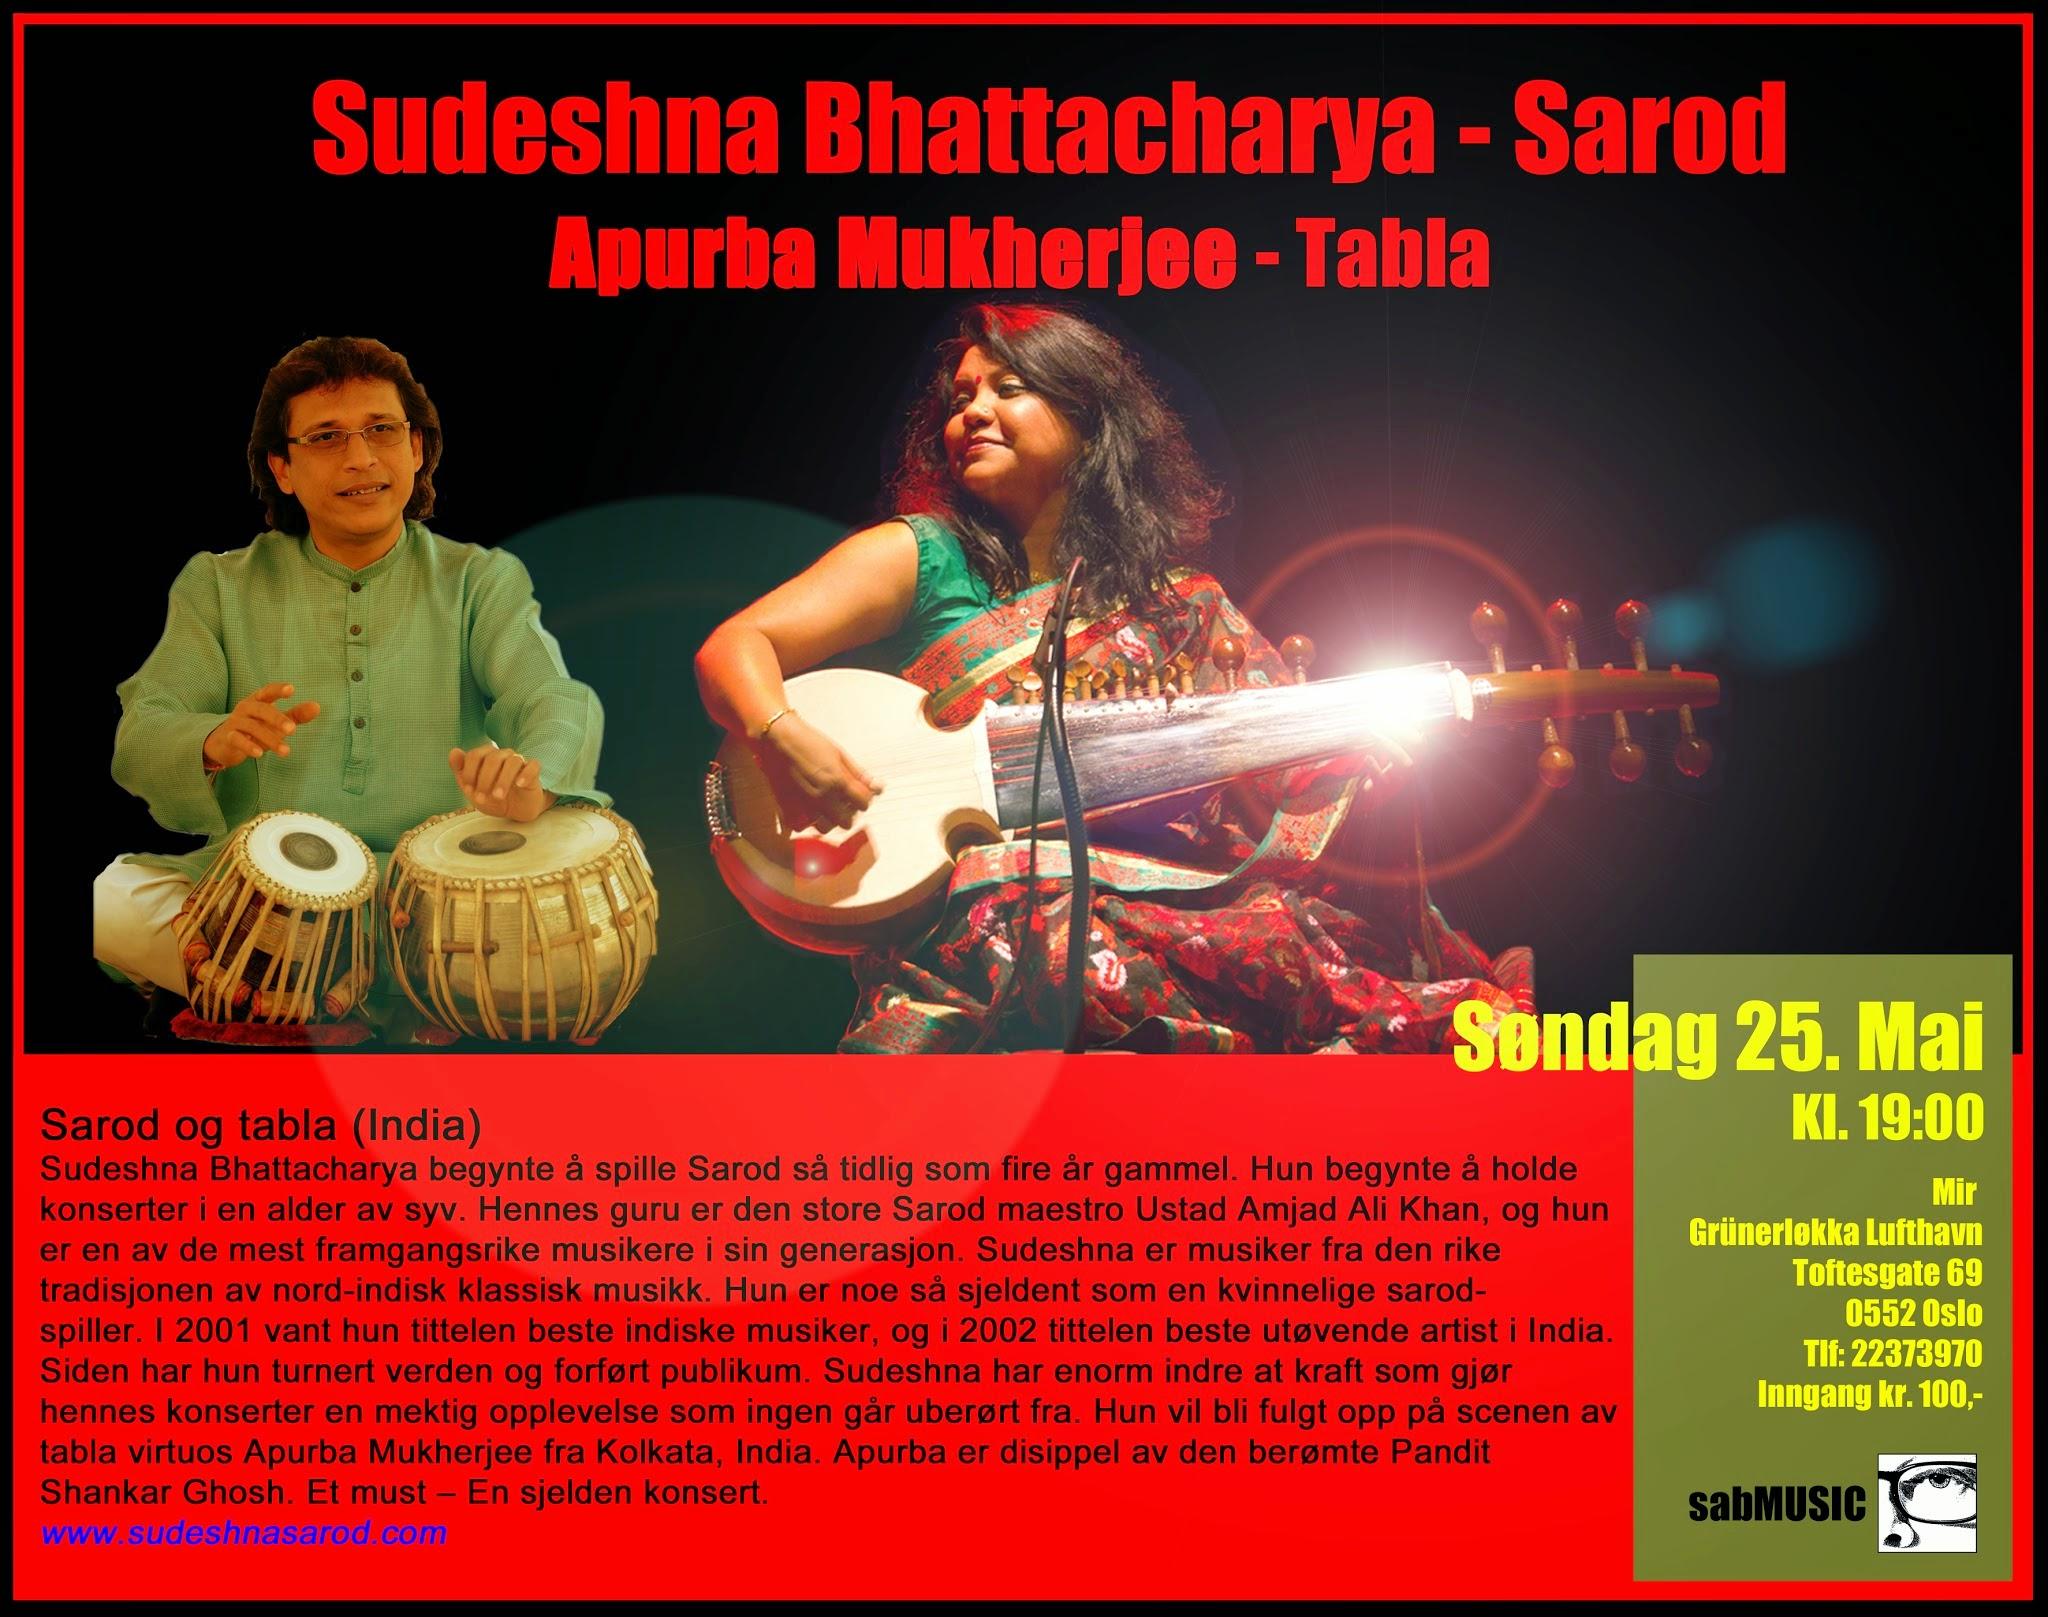 Photo: Sudeshna Bhattacharya - Sarod - Mir, Oslo 25. May 2014 - sabART